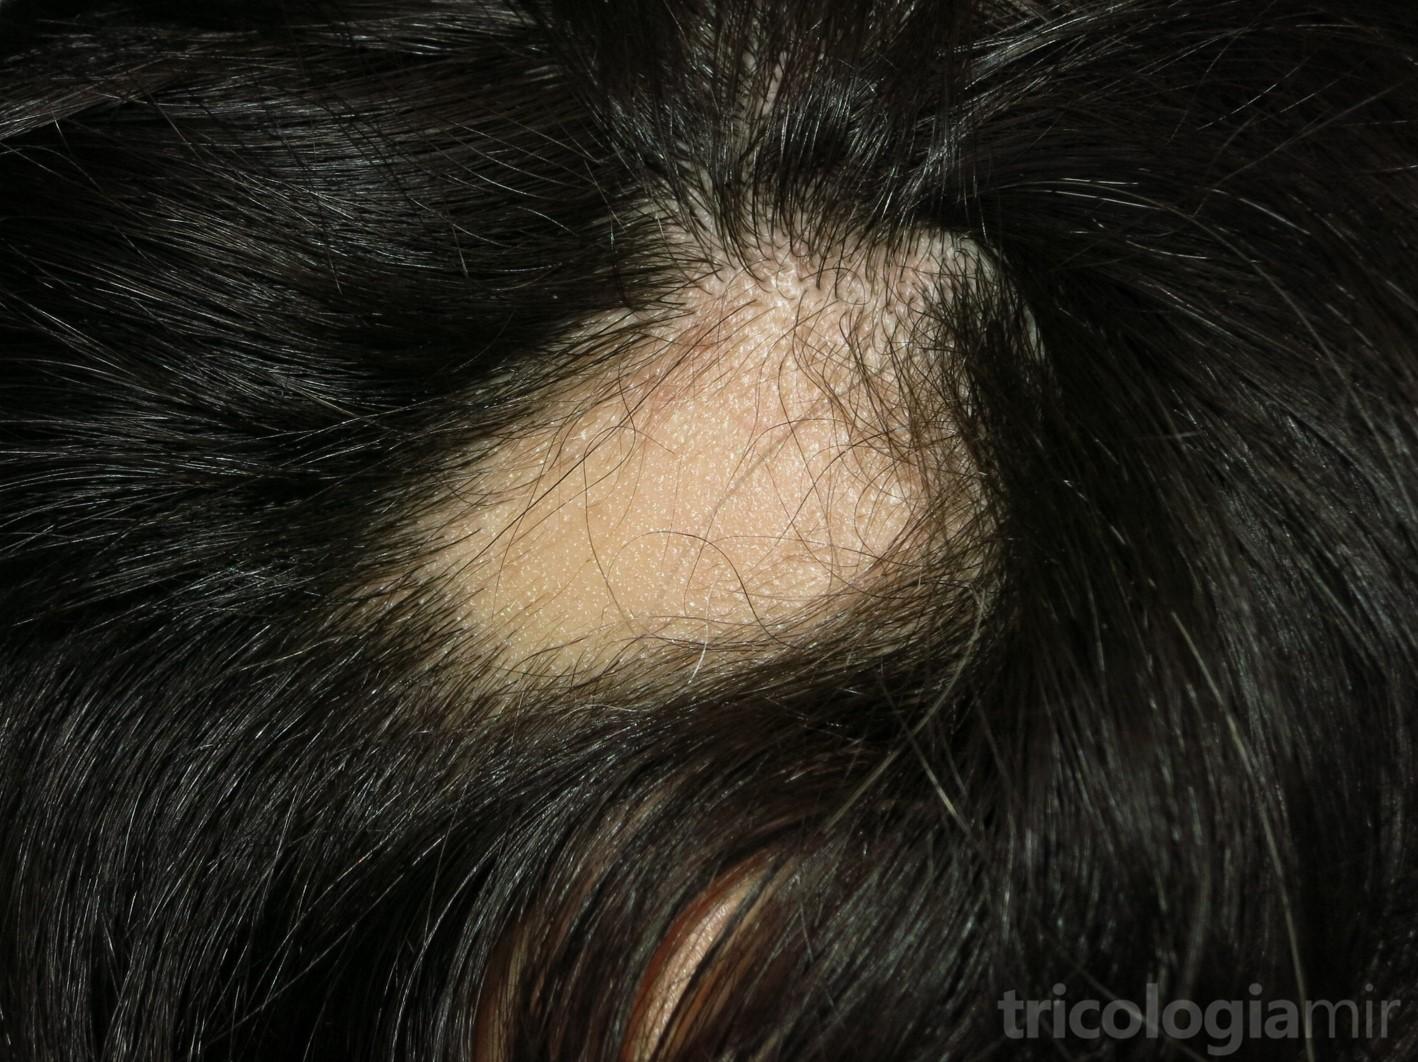 Placa única de alopecia areata